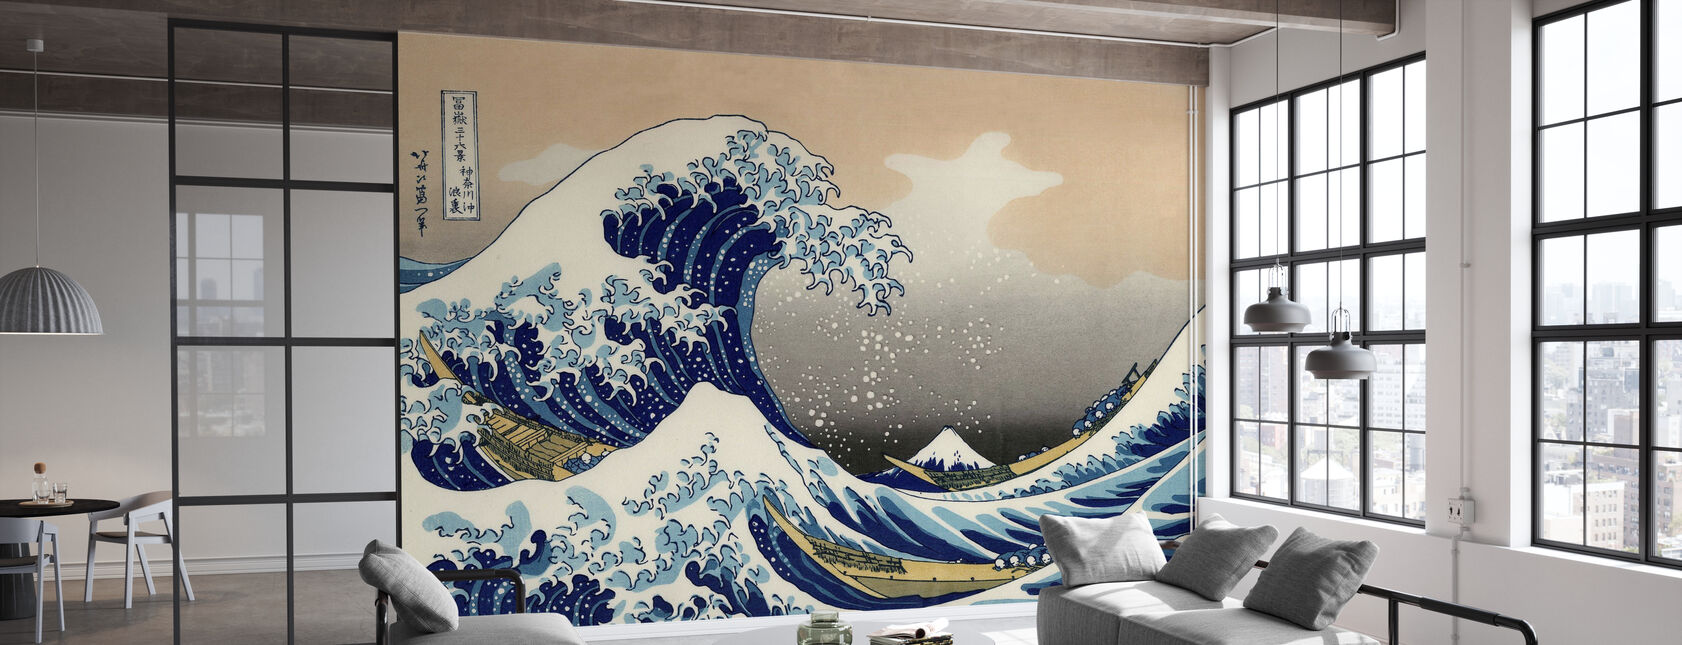 Great Wave, Katsushika Hokusai - Wallpaper - Office